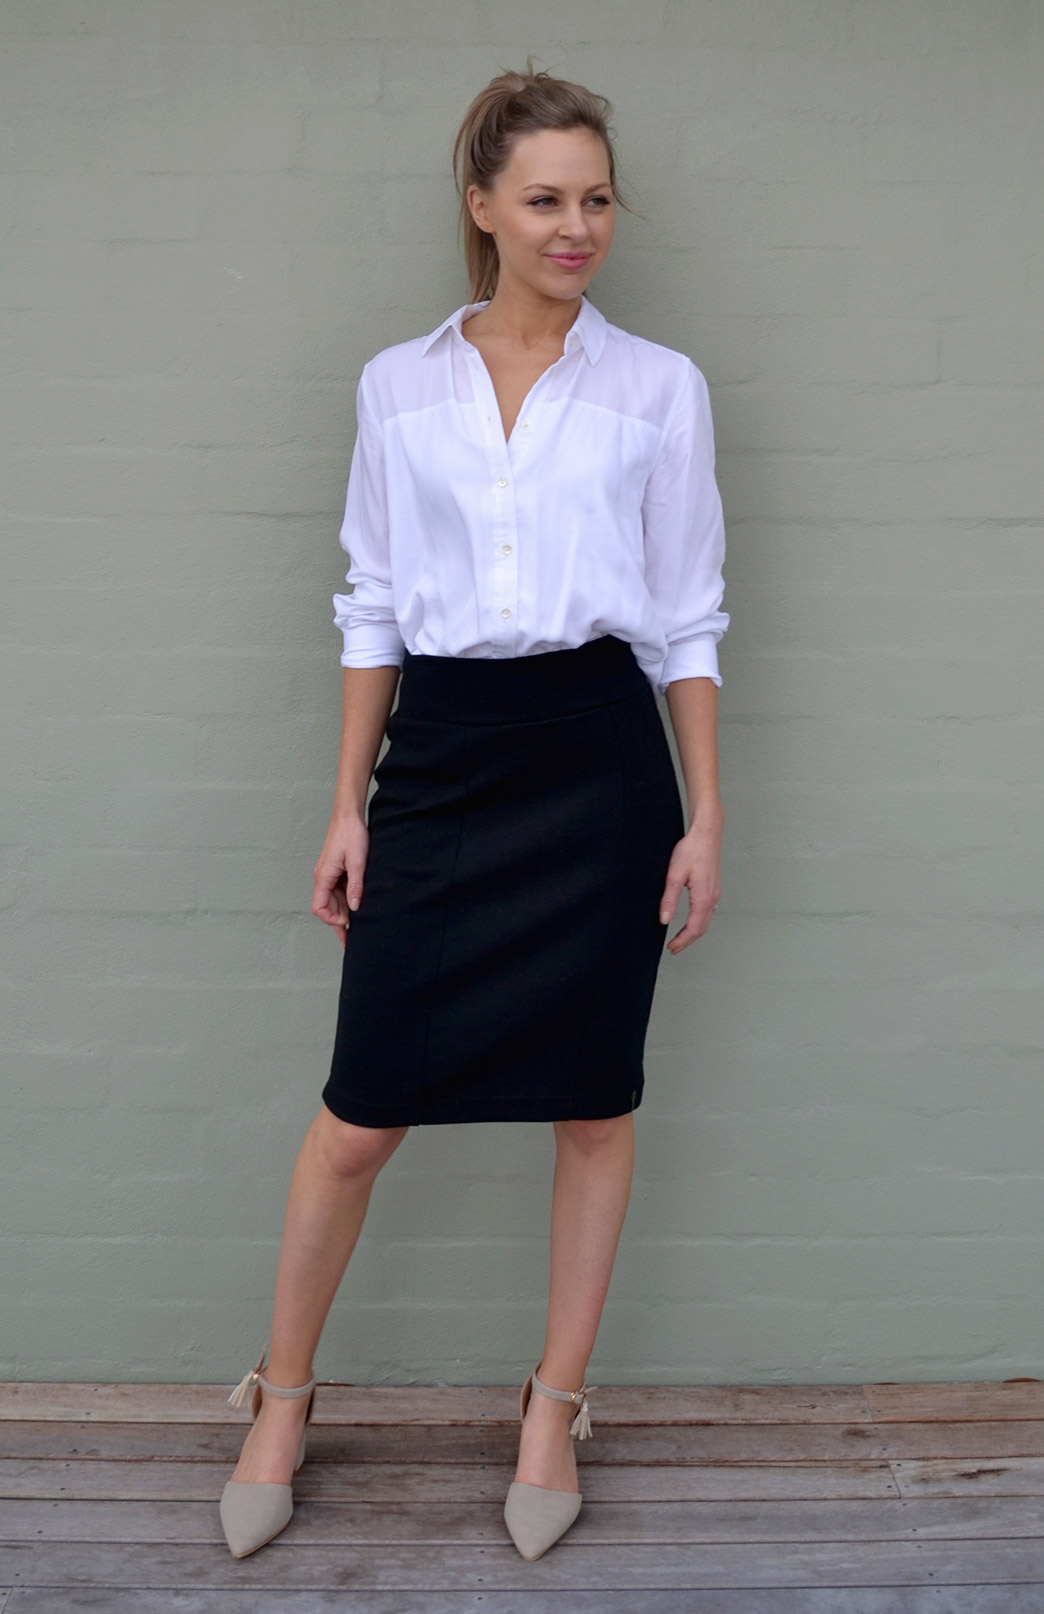 Straight Skirt - Women's Black Straight Office Wool Skirt - Smitten Merino Tasmania Australia